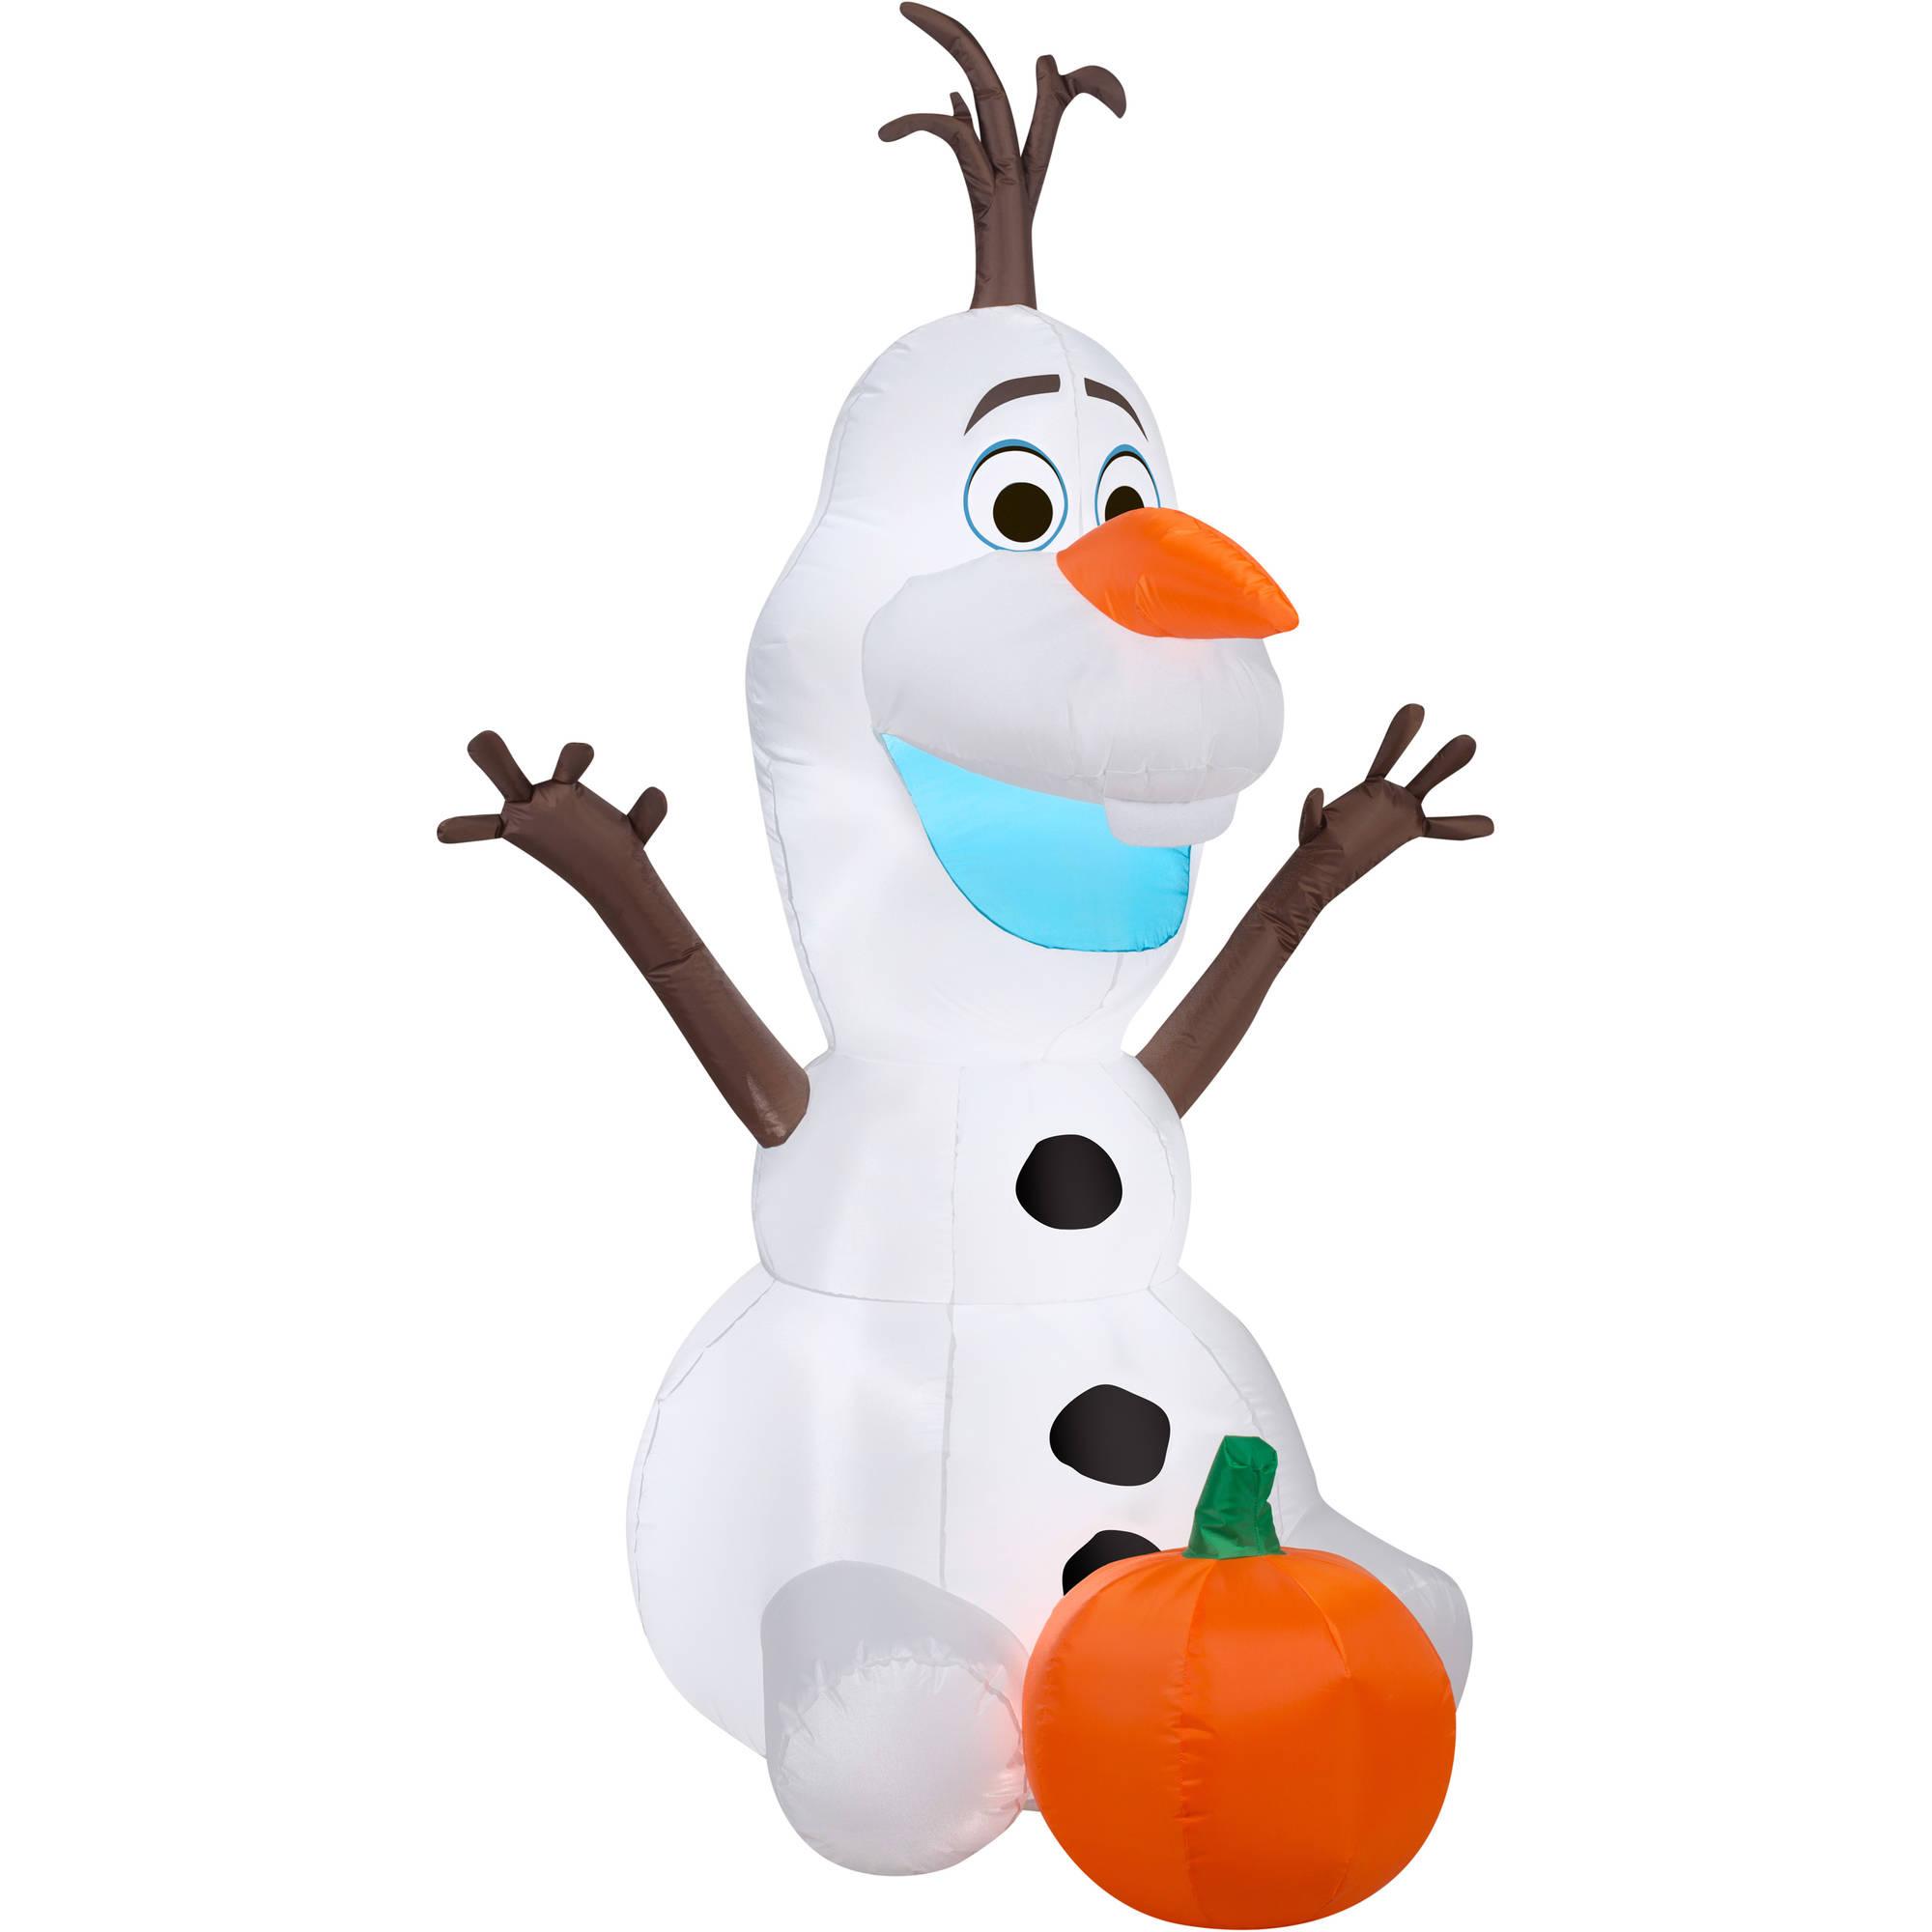 Frozen 5' Airblown Inflatable Frozen Olaf Holding Pumpkin ...